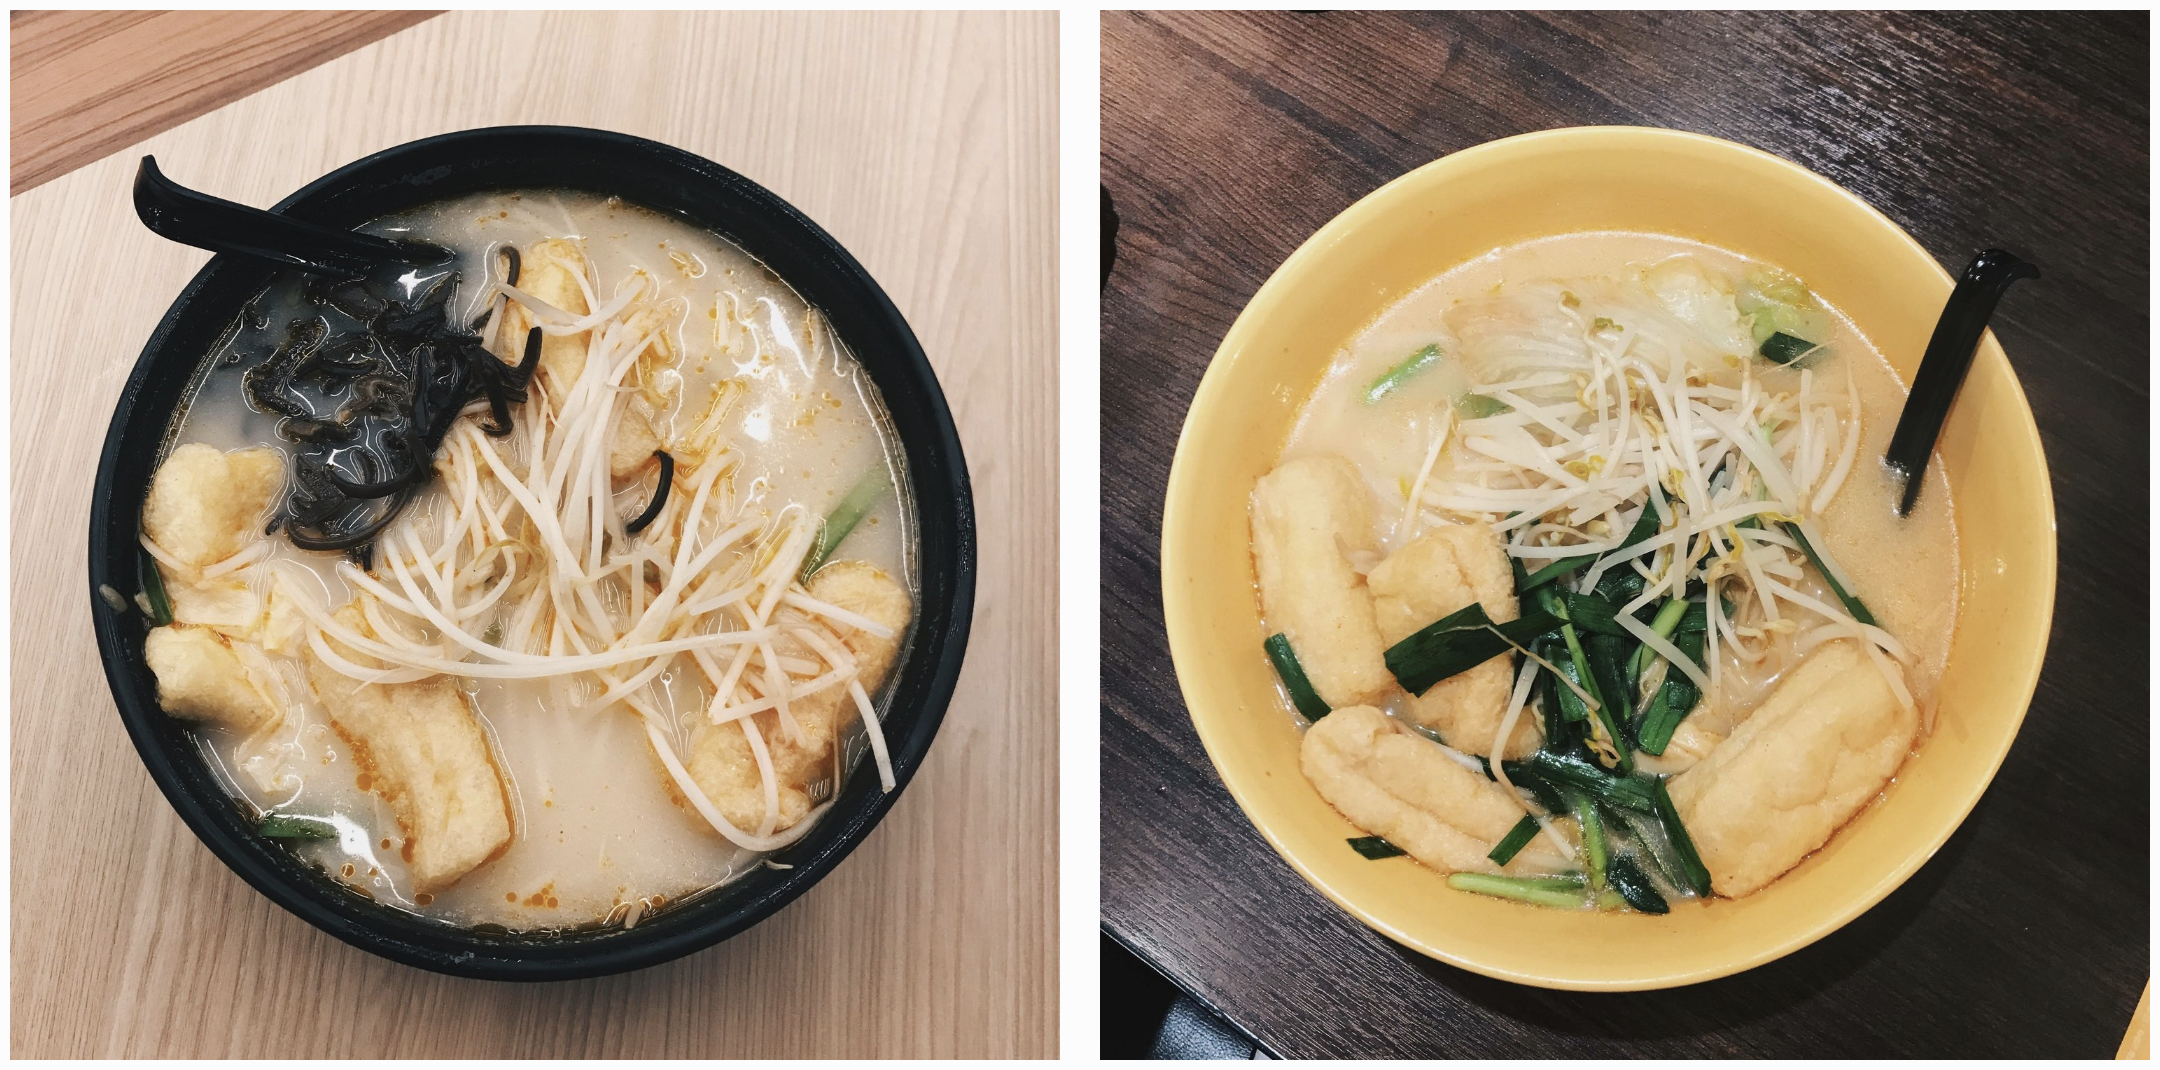 譚仔三哥米線Tam Jai Yunnan Noodles -